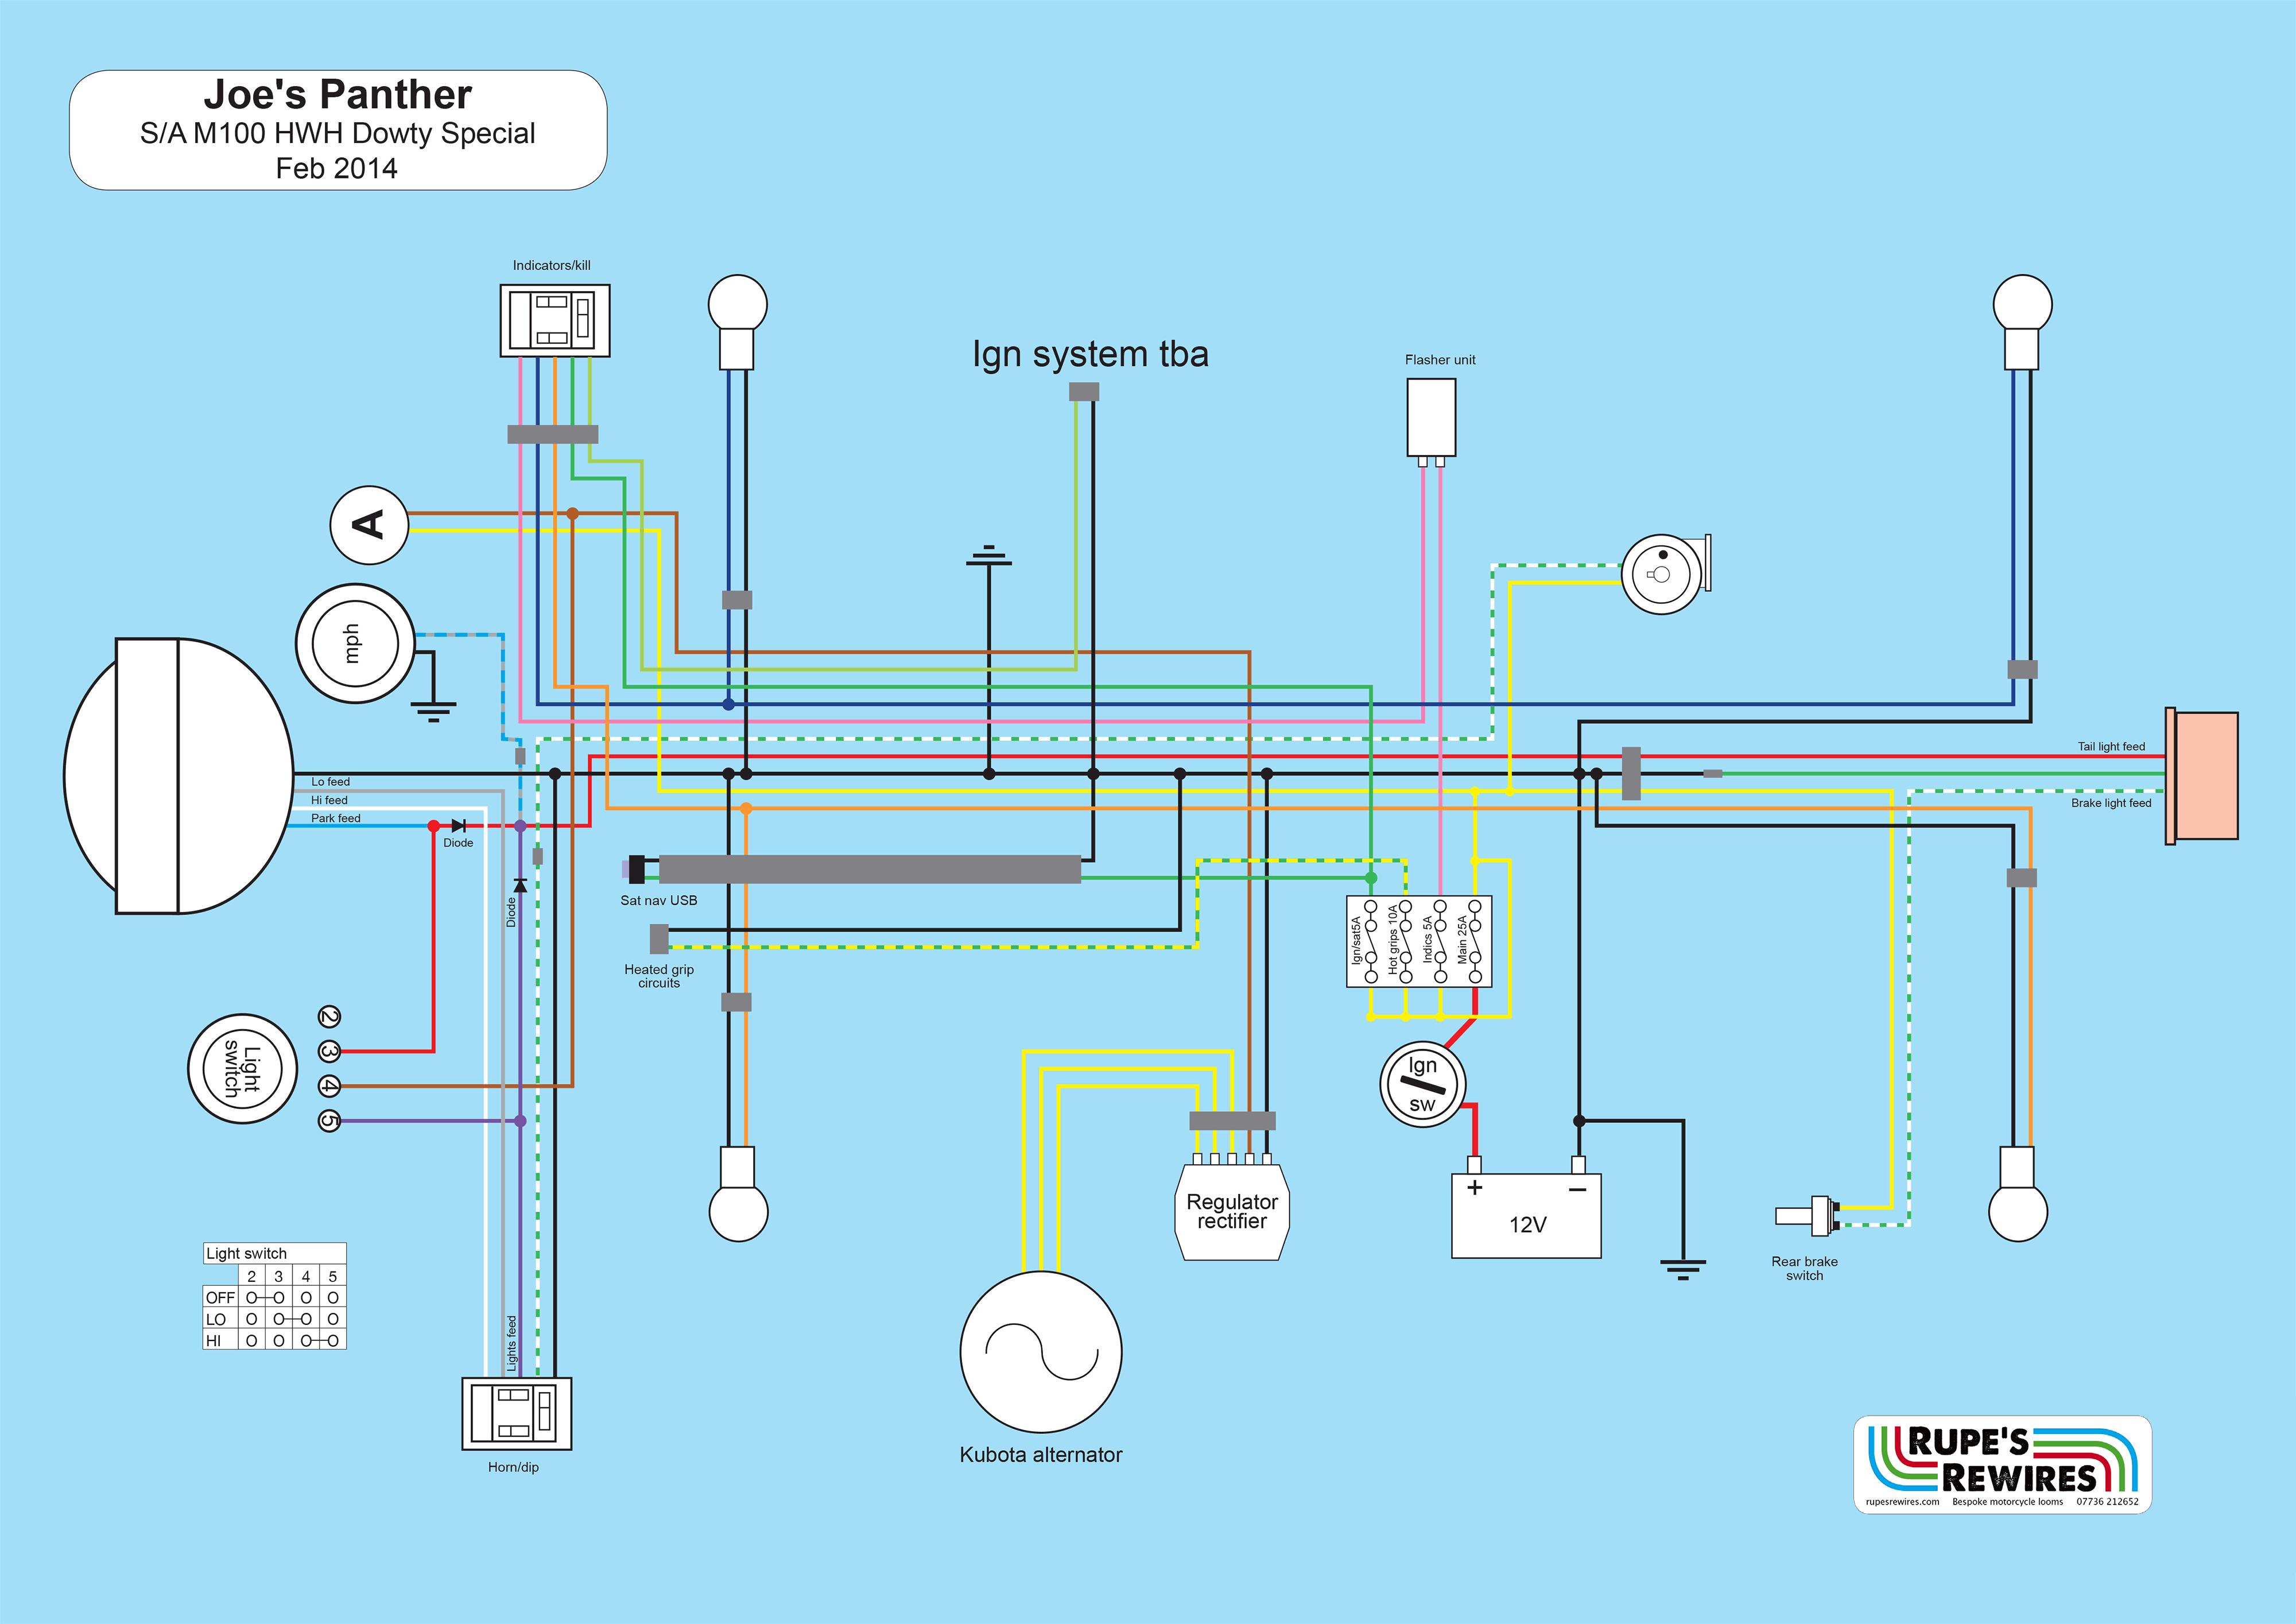 Unusual Kubota Dynamo Wiring Diagram Pictures Inspiration ...